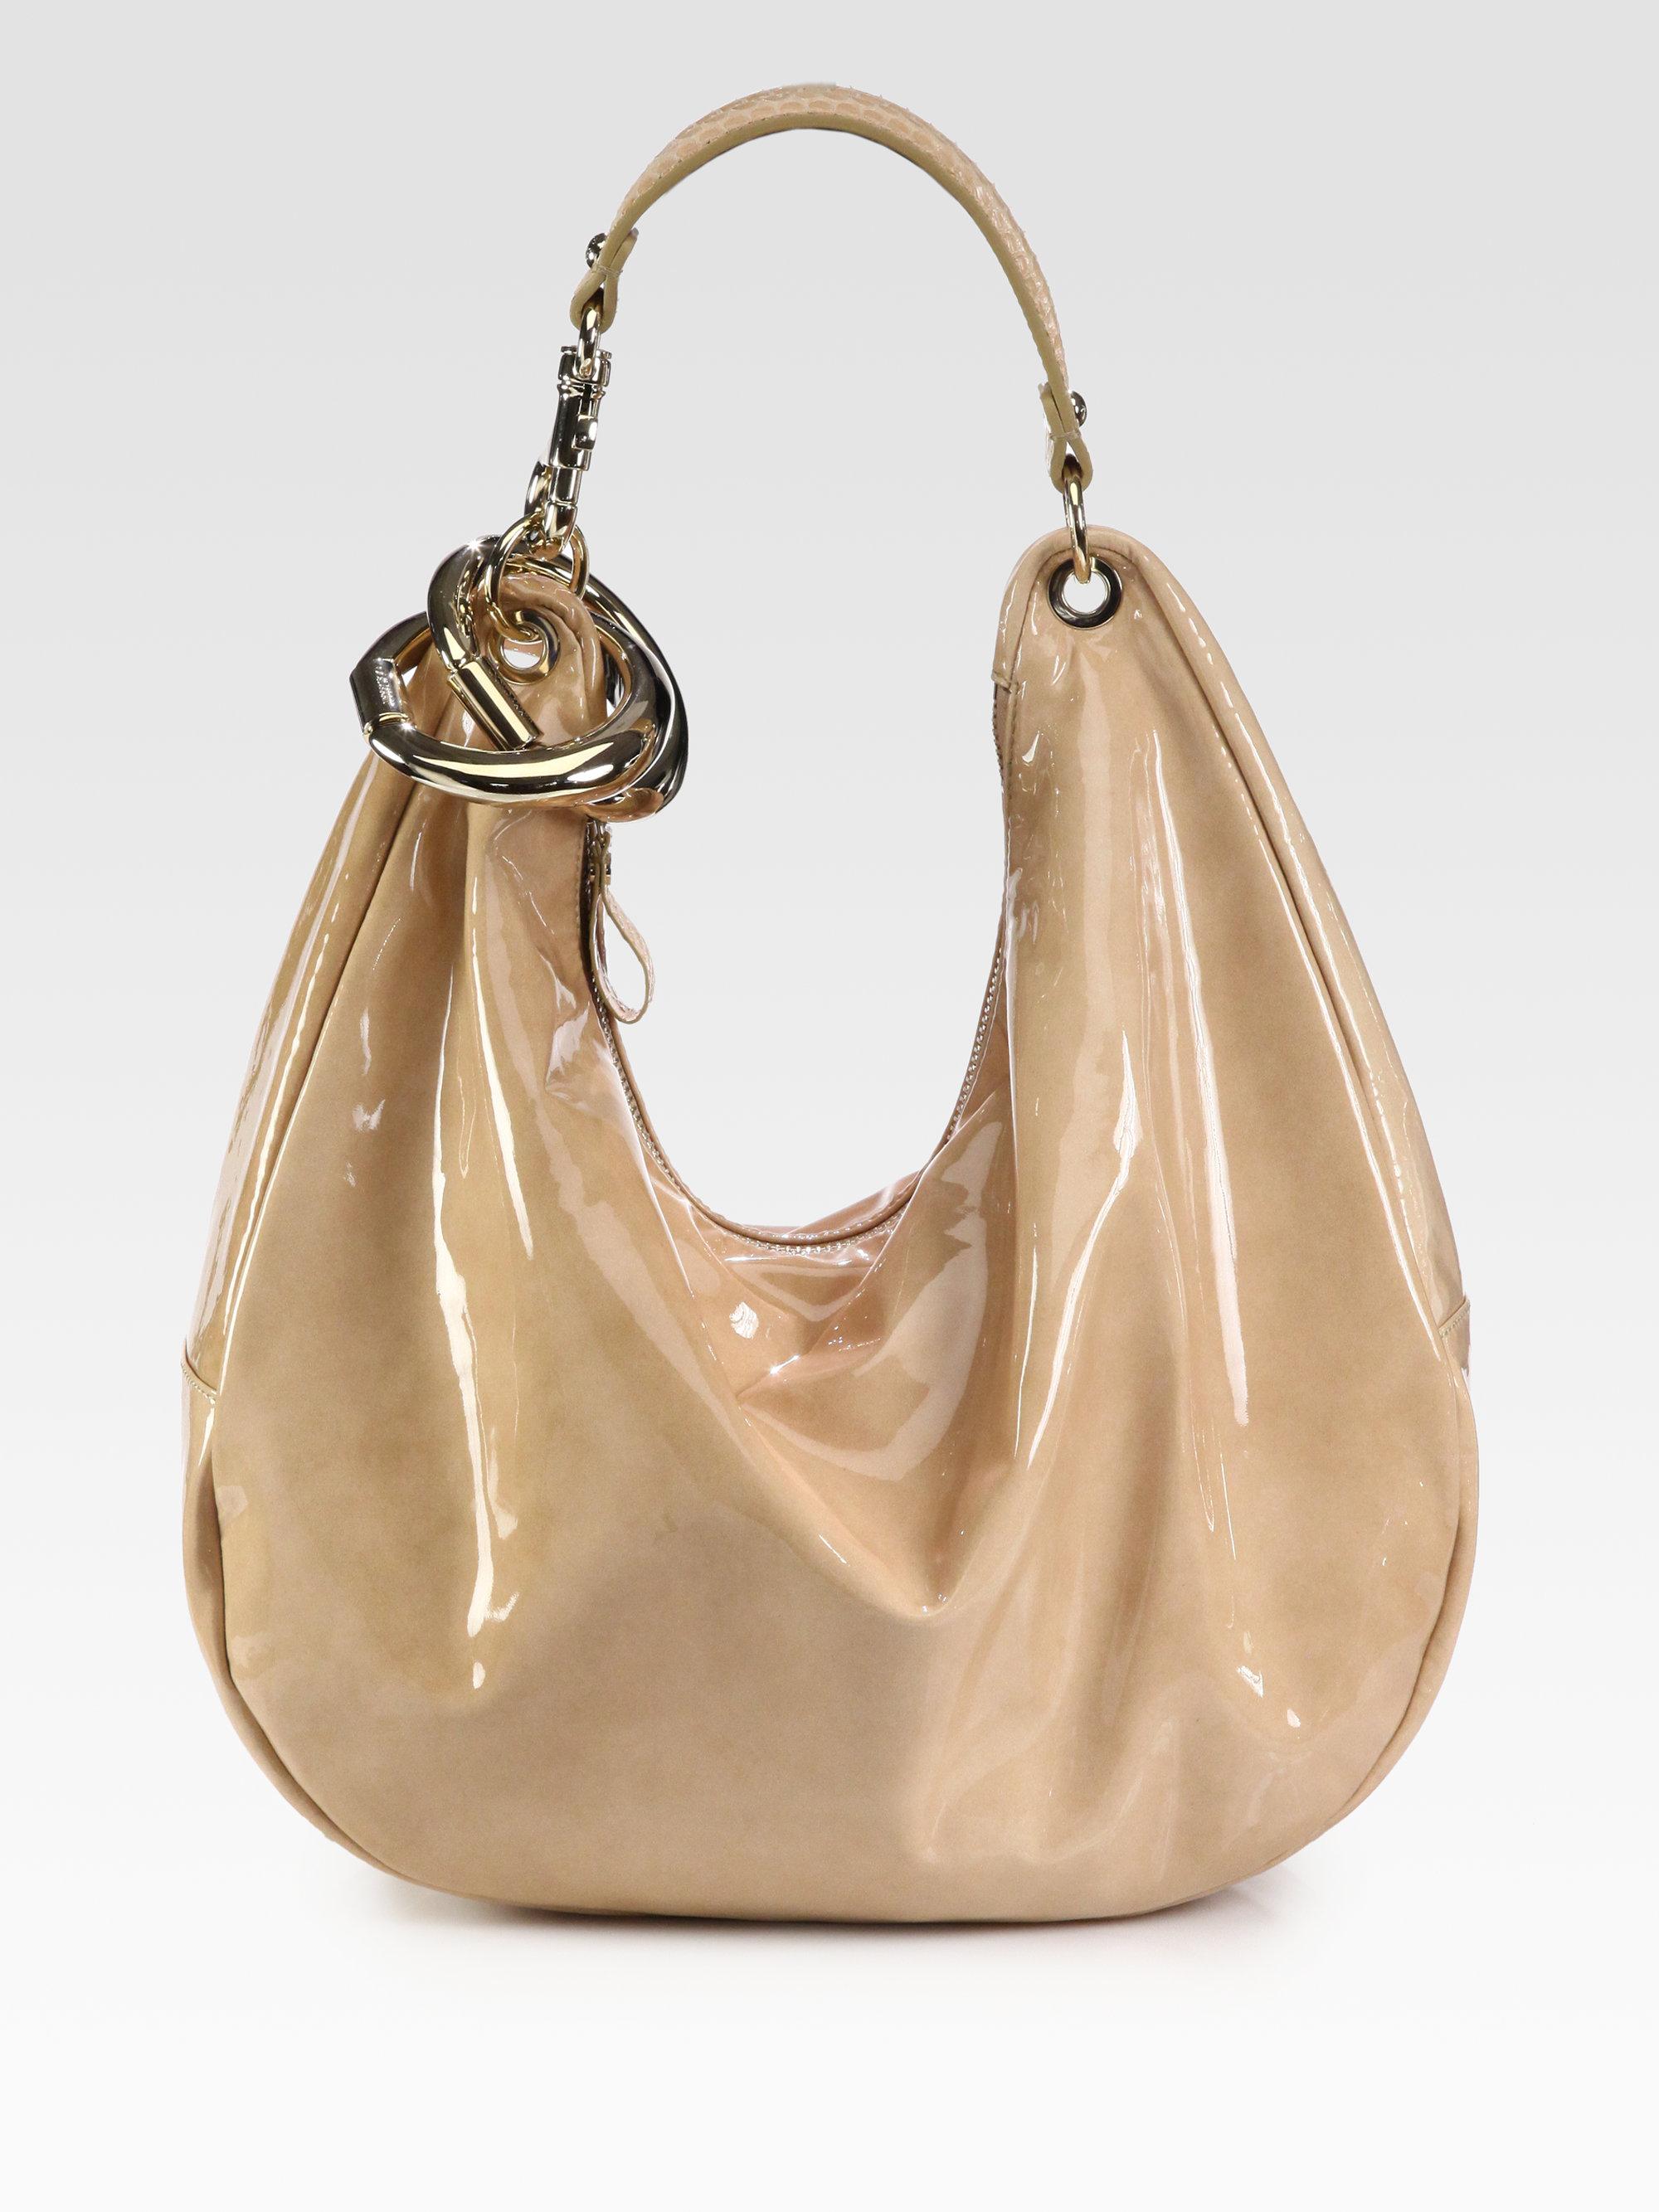 jimmy choo handbags - HD2000×2667